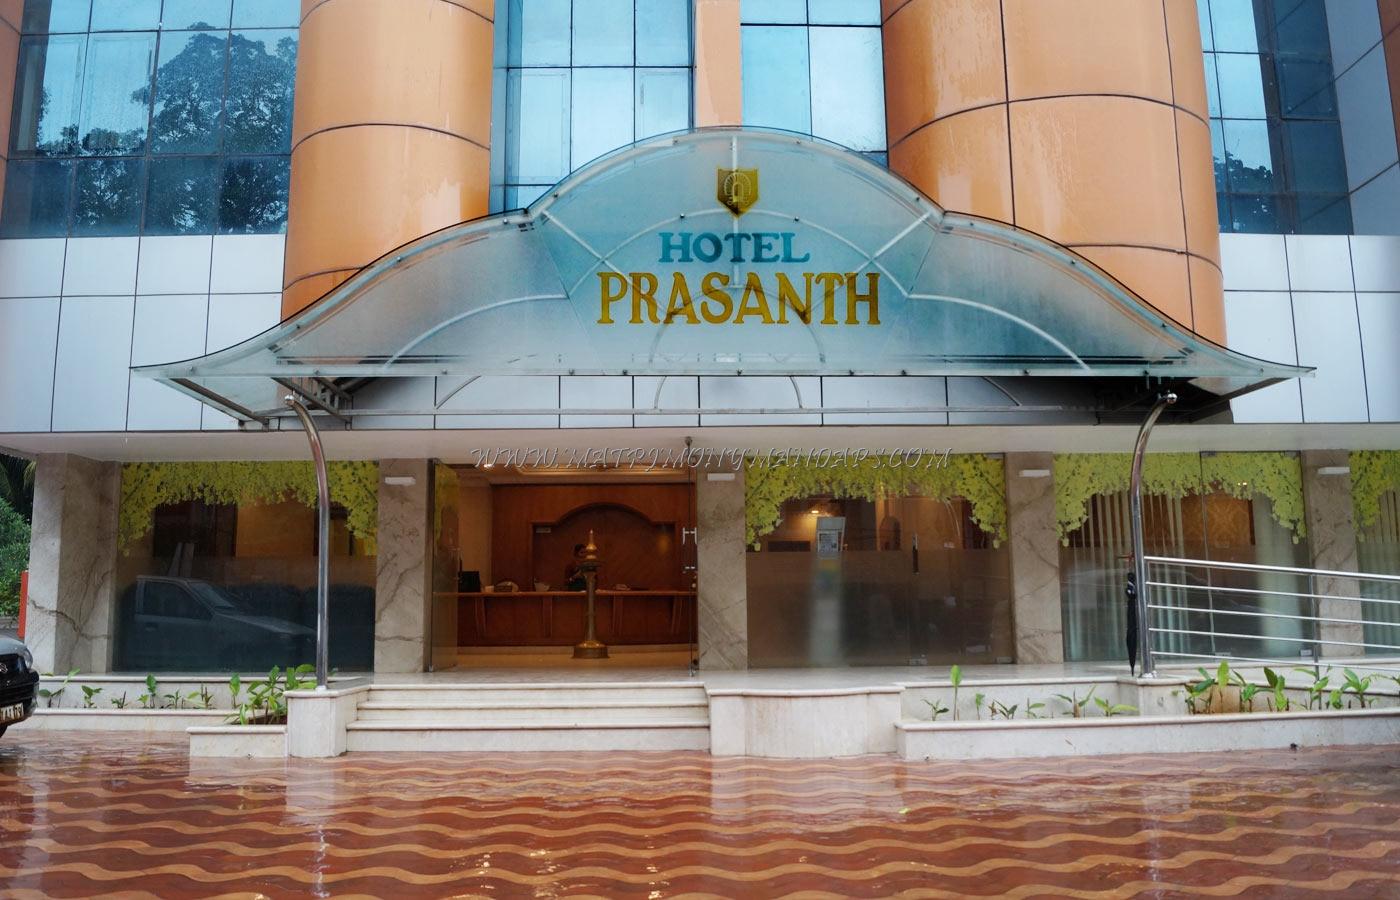 Hotel Prasanth Delight - Entrance